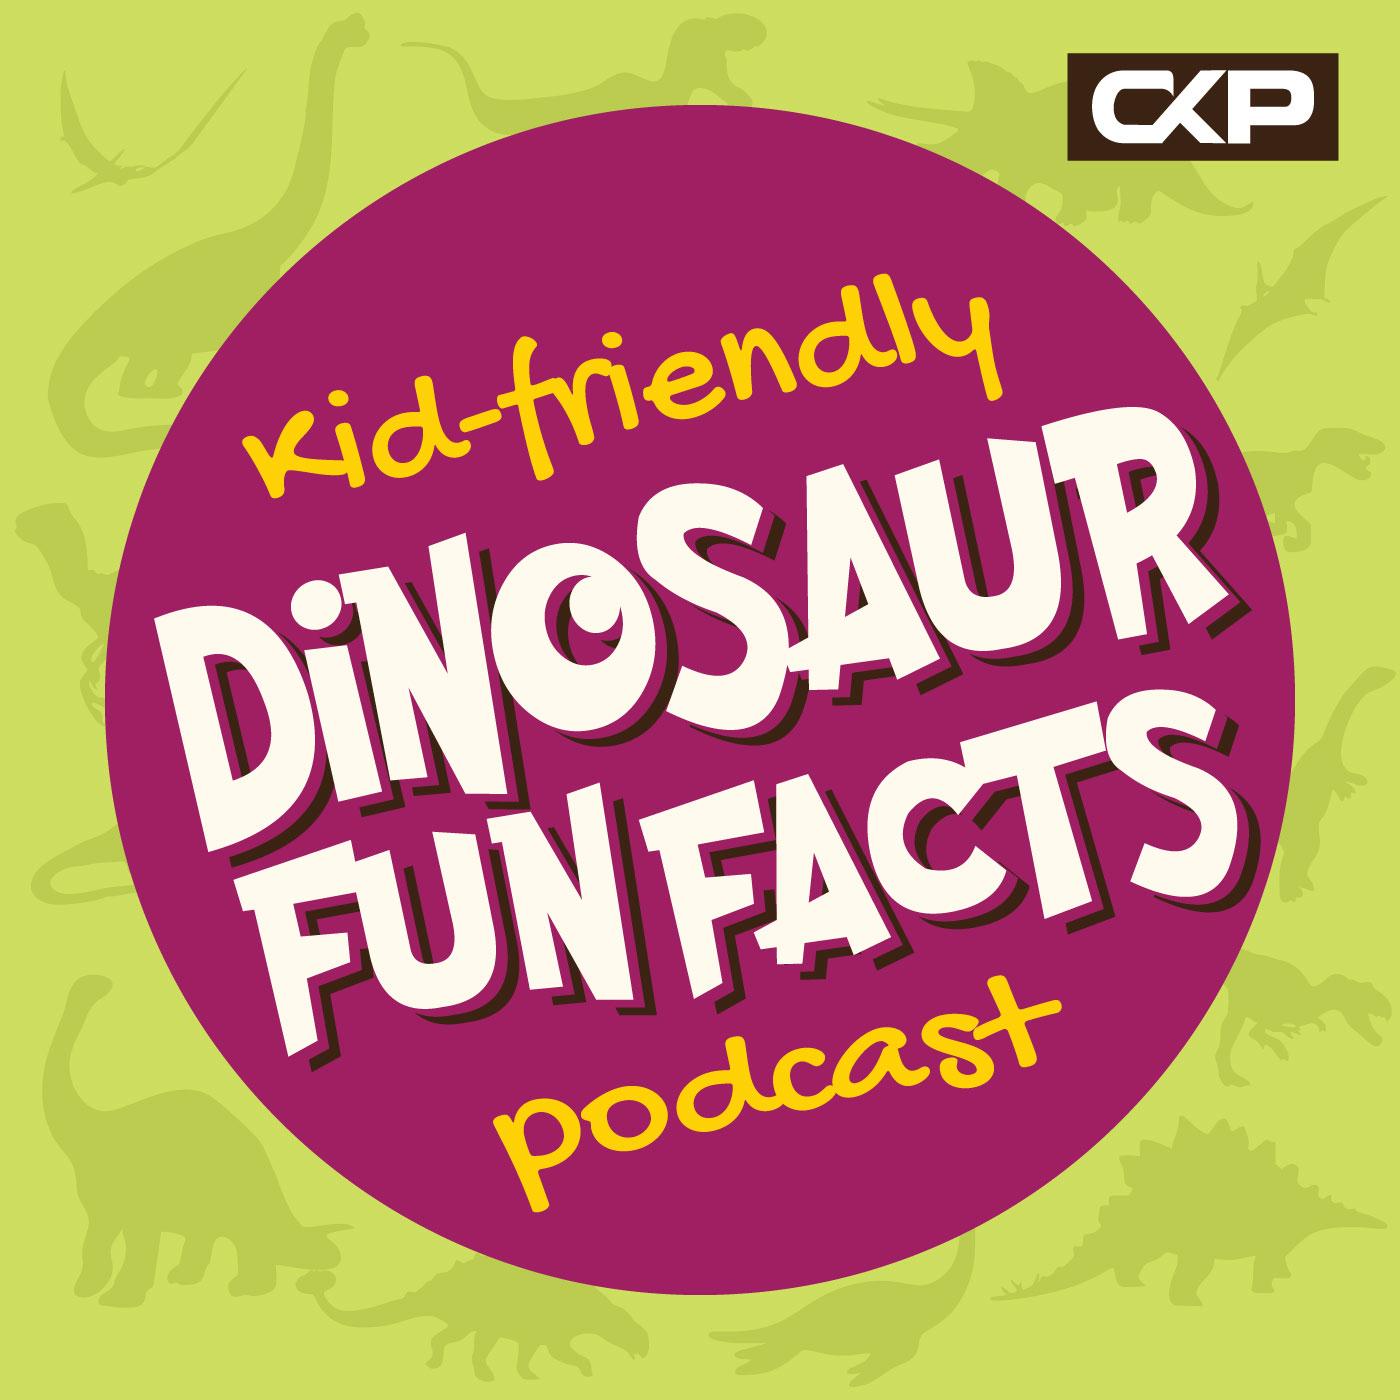 Kid Friendly Dinosaur Fun Facts Podcast show art